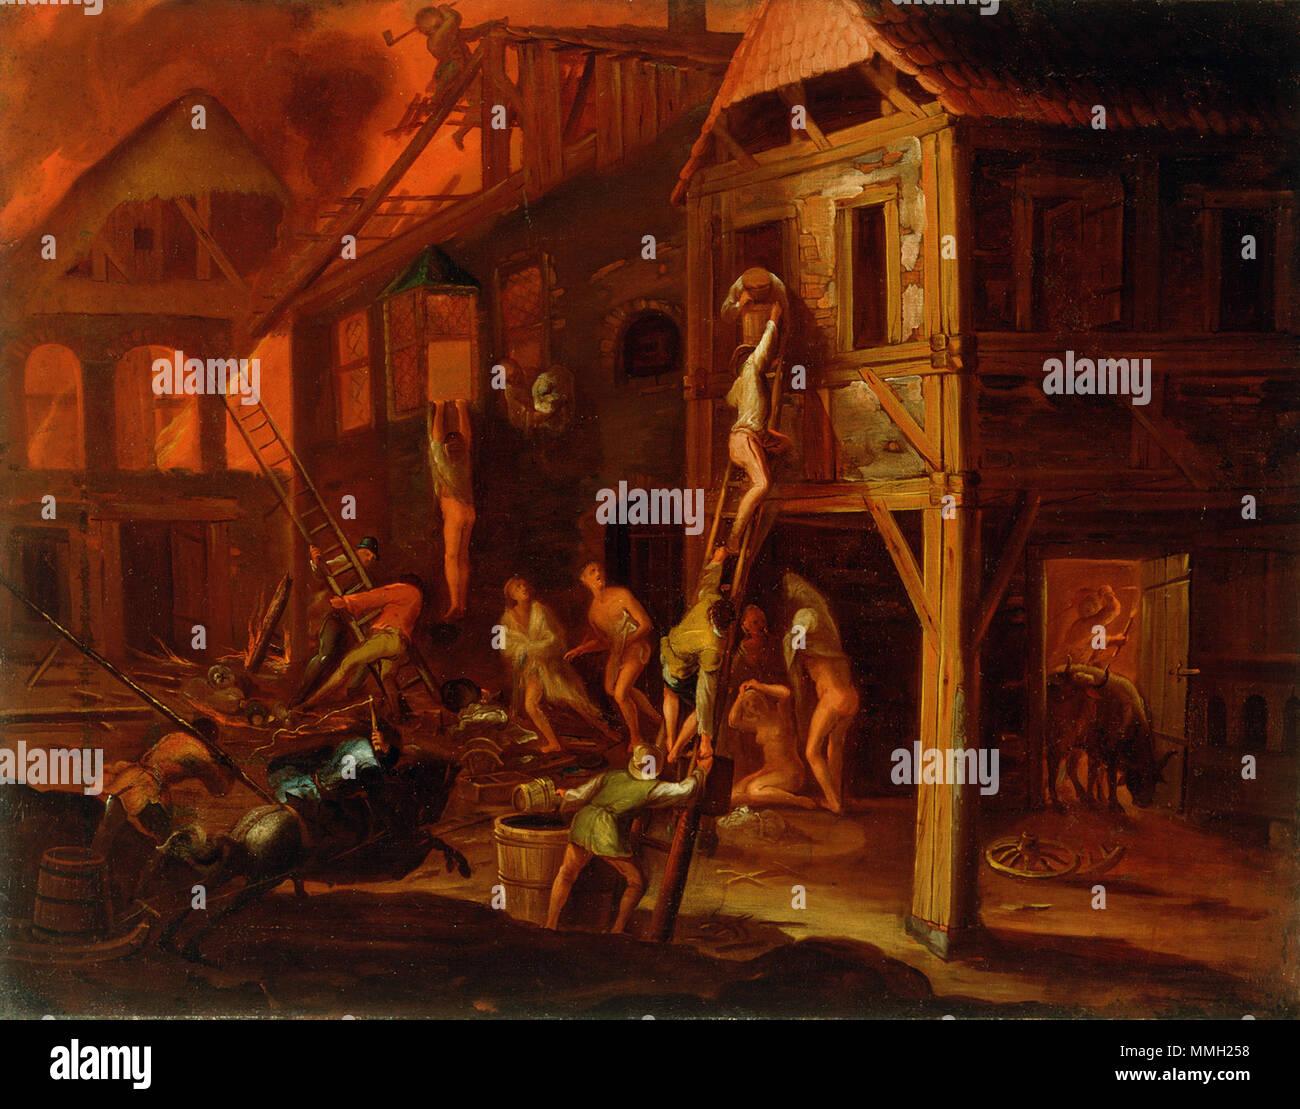 4 T Gillis van Valckenborch - Požar na vasi Immagini Stock